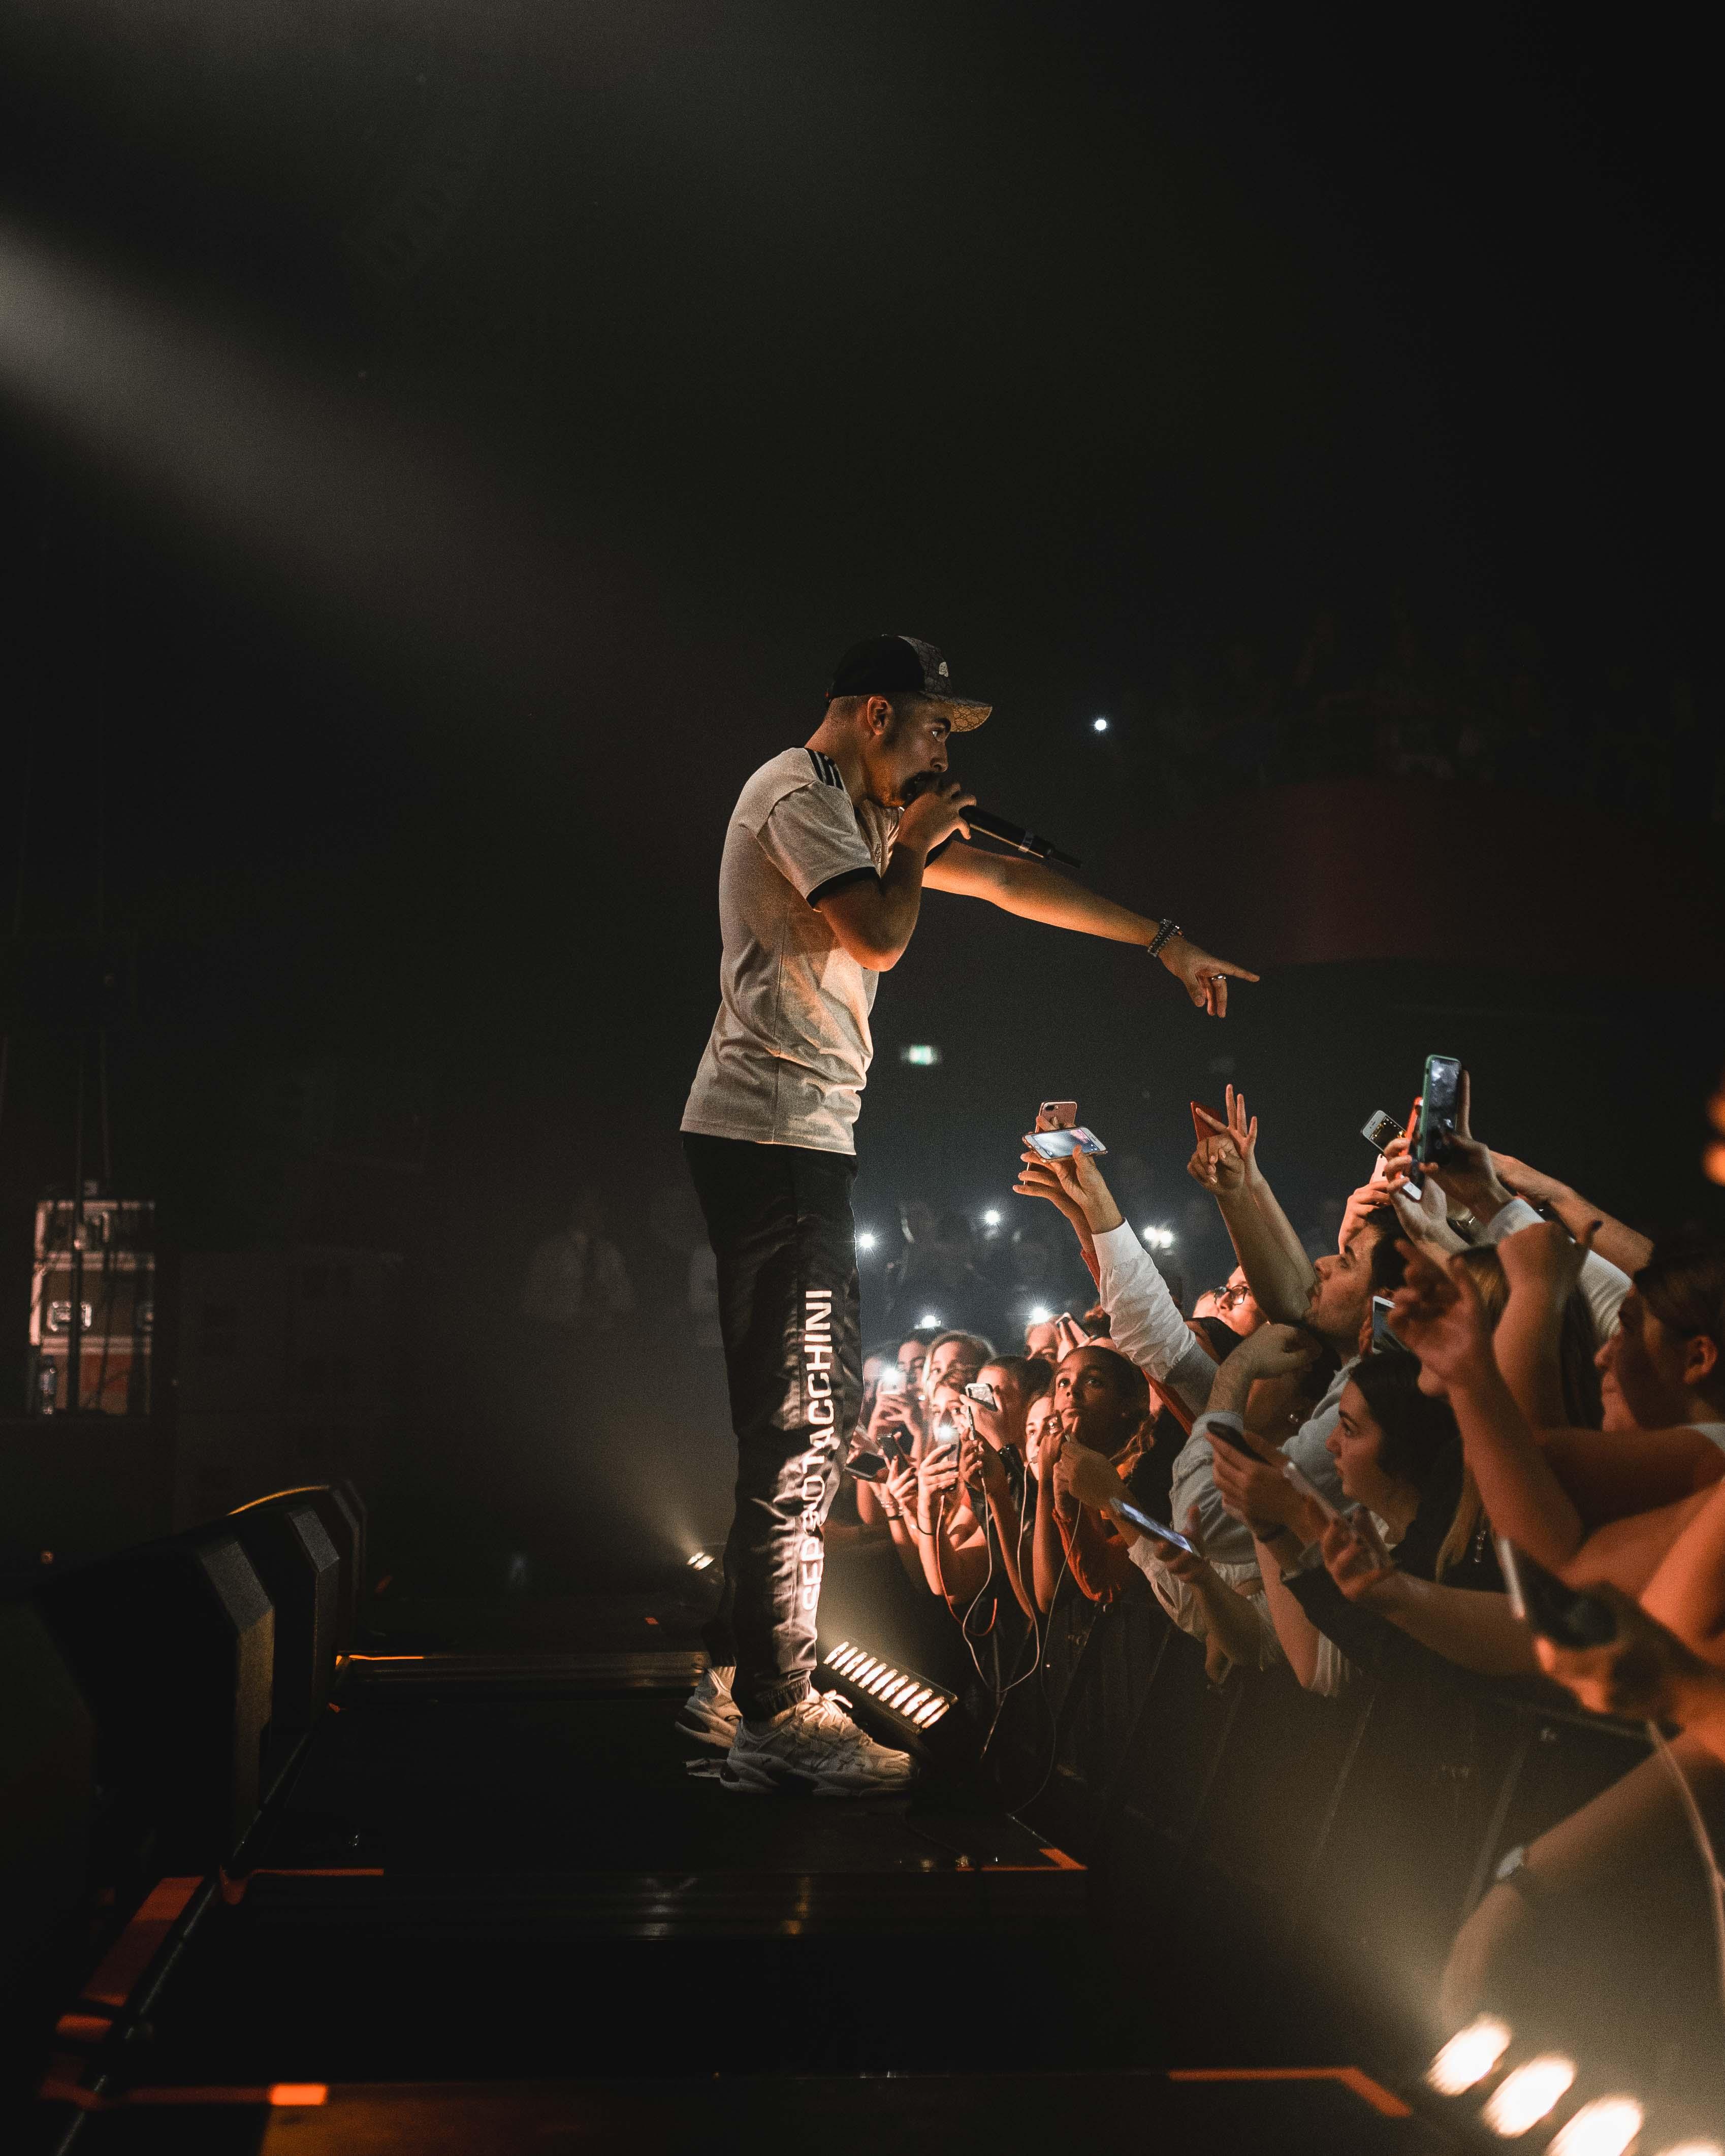 rk en concert a grenoble 2019